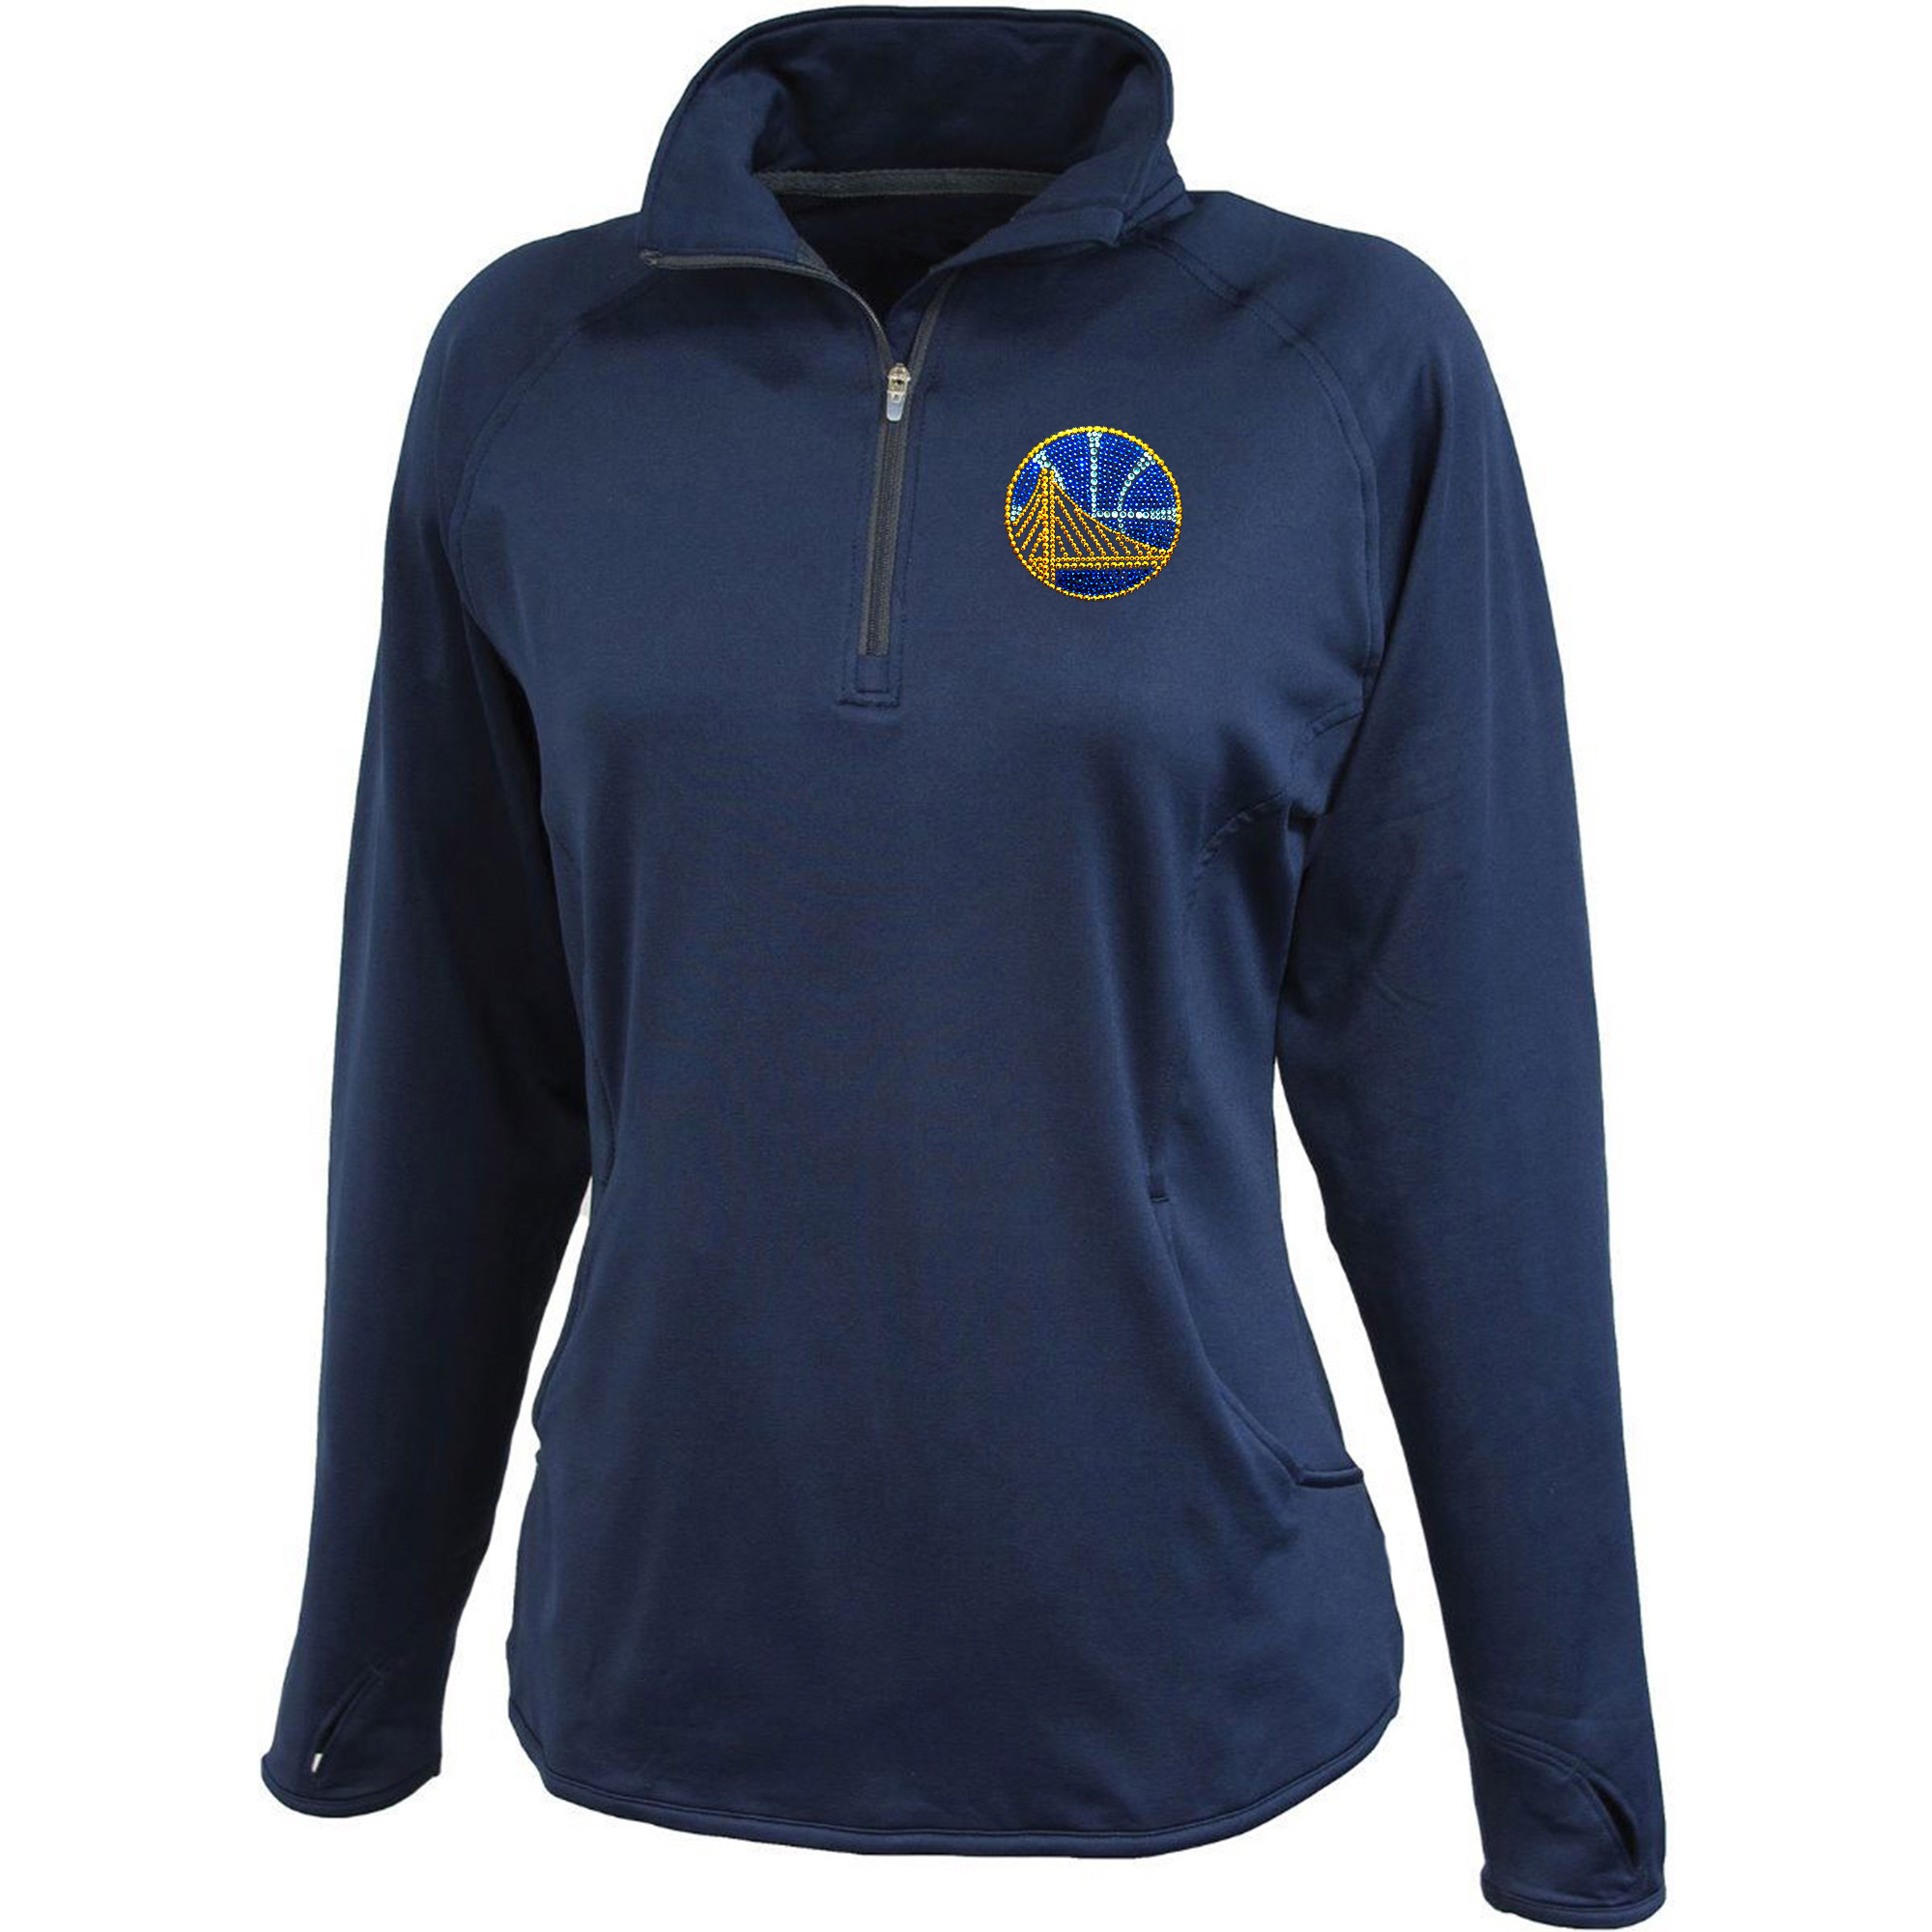 Golden State Warriors Women's Rhinestone 1/4 Zip Jacket - Navy